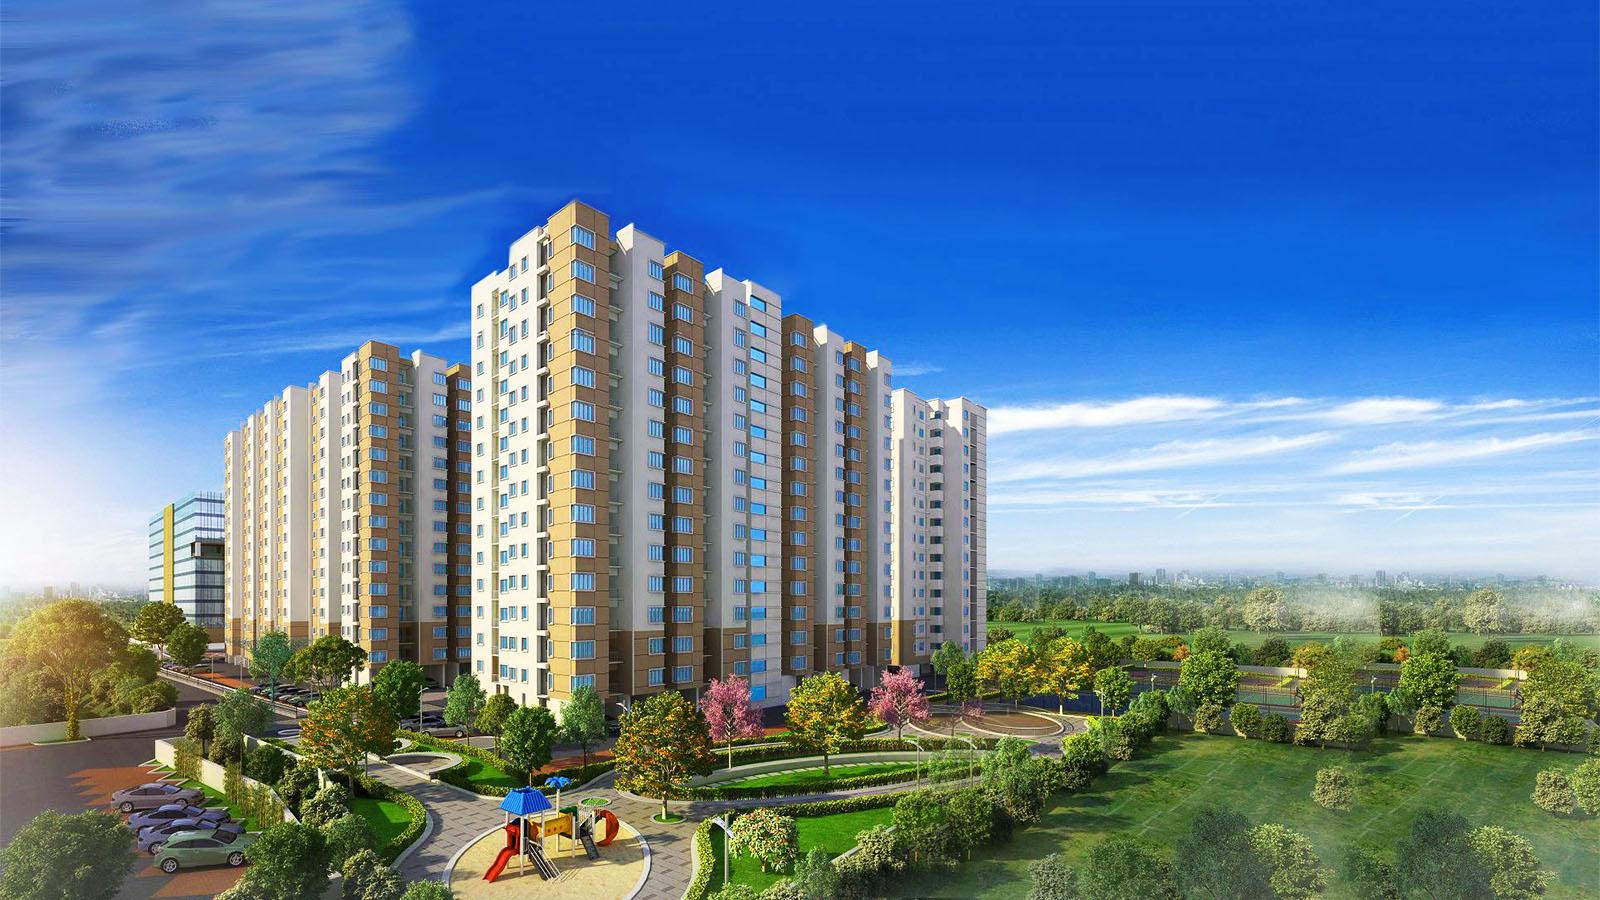 flats-in-pallavaram-chennai-for-sale